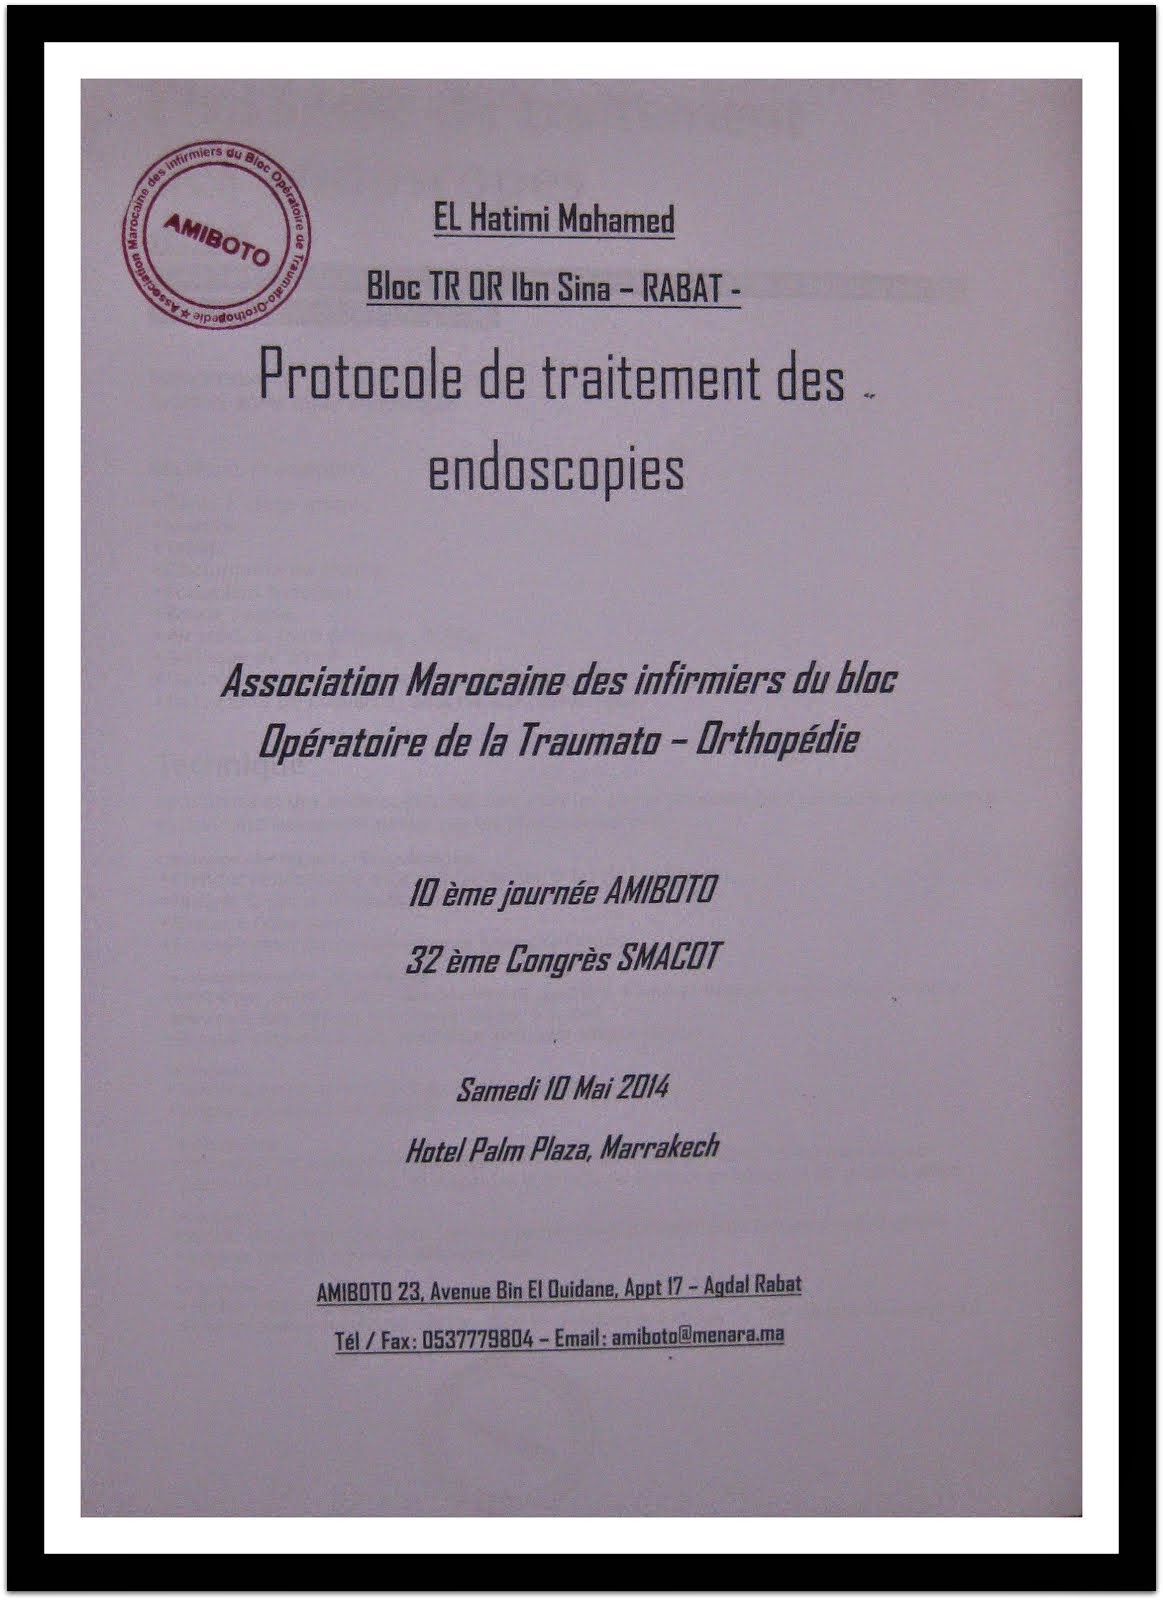 PRATOCOLE TRAITEMENT DES EMDOSCOPIES